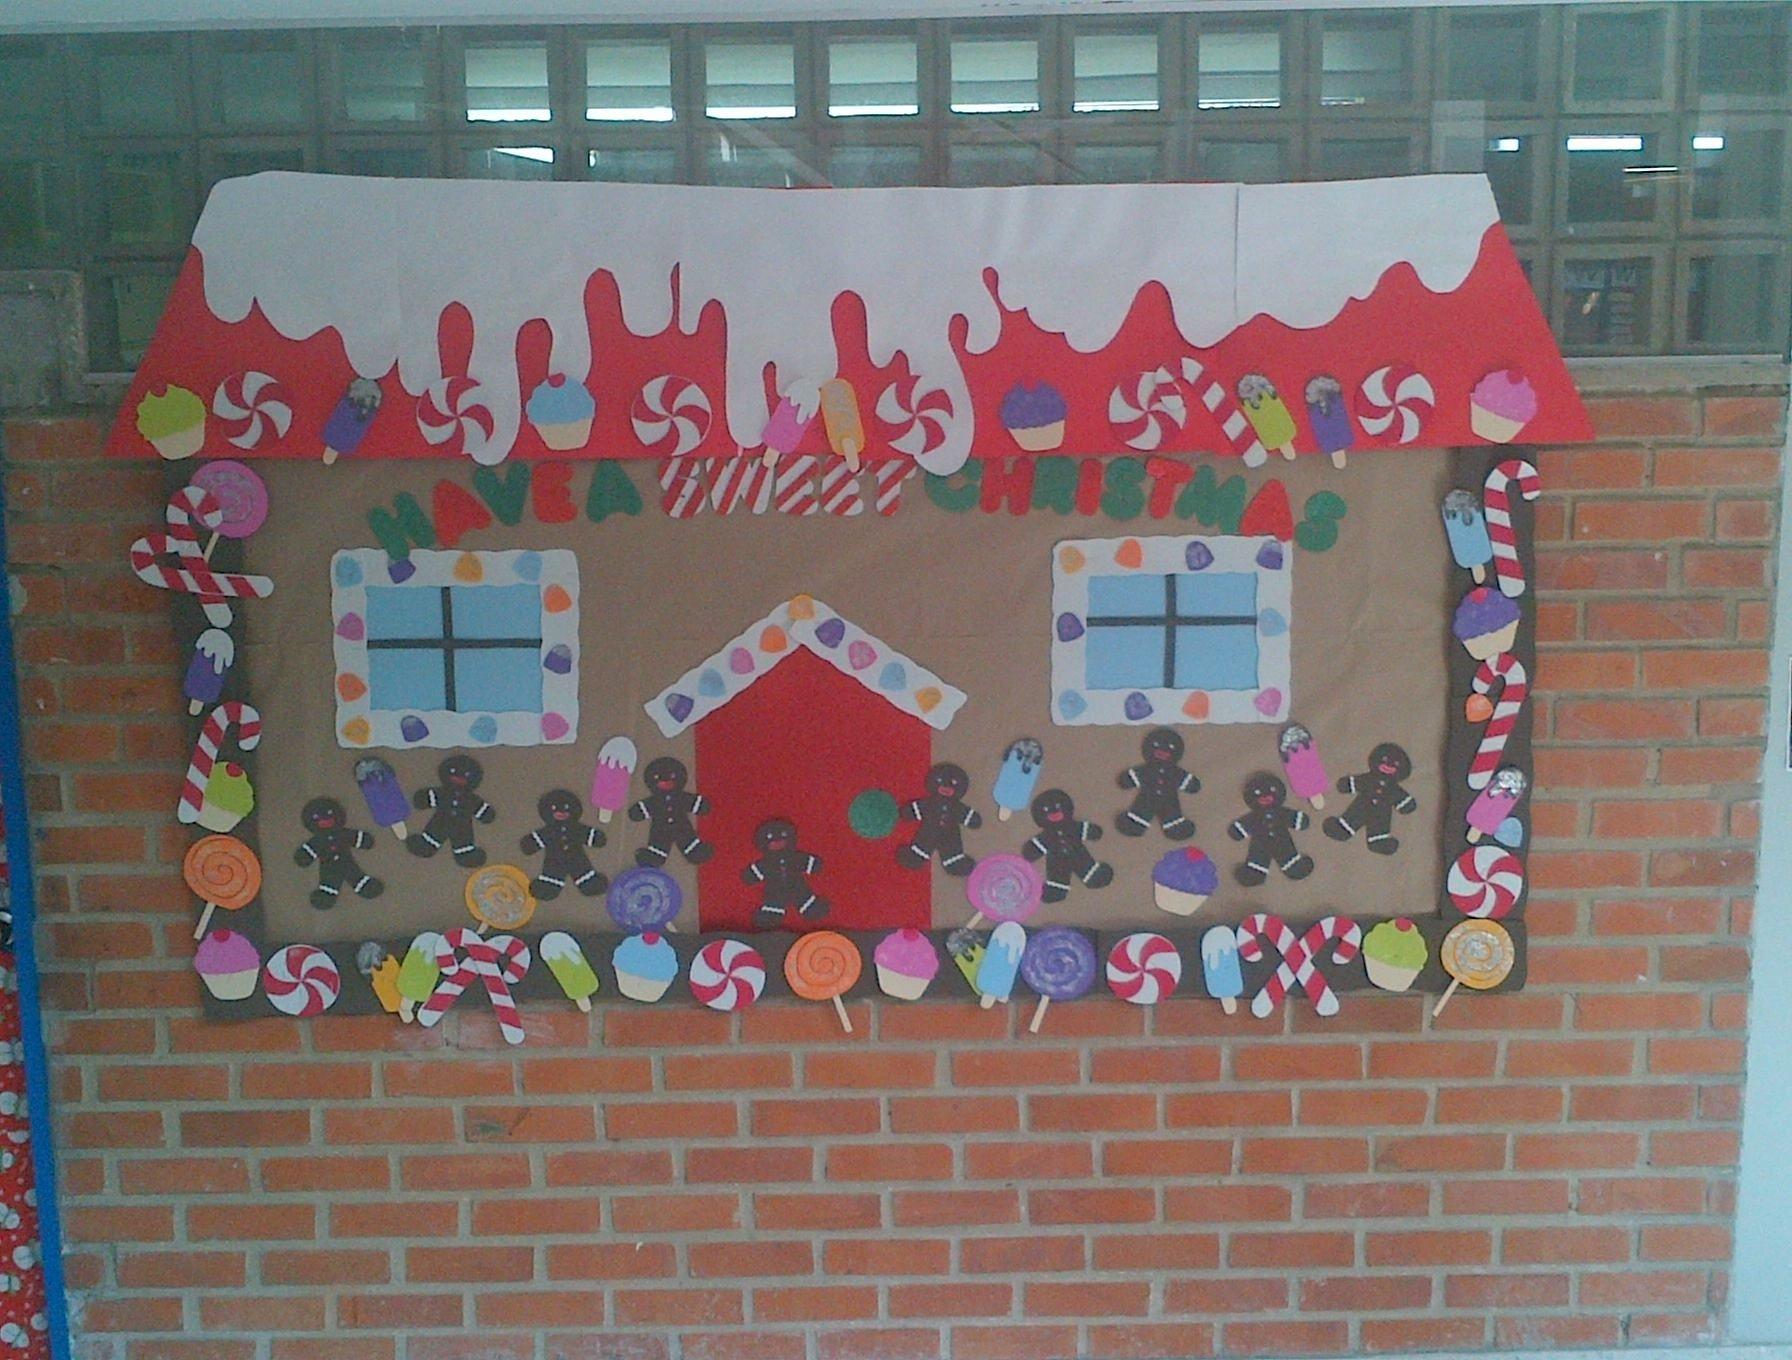 10 Wonderful Preschool Christmas Bulletin Board Ideas christmas bulletin boardjust make the b board into the house 3 2020